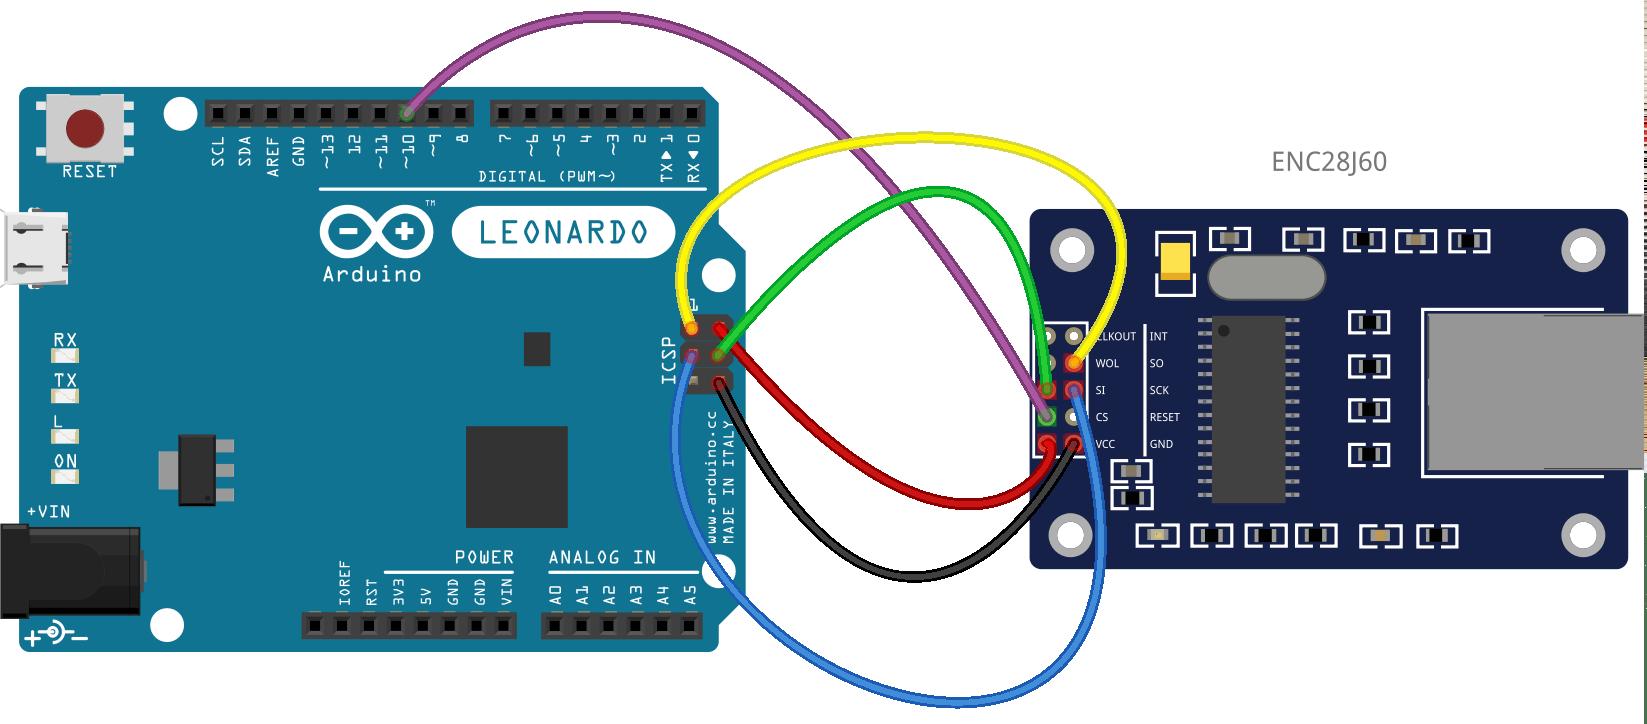 hight resolution of arduino leonardo and spi communications using the enc28j60 ethernet module